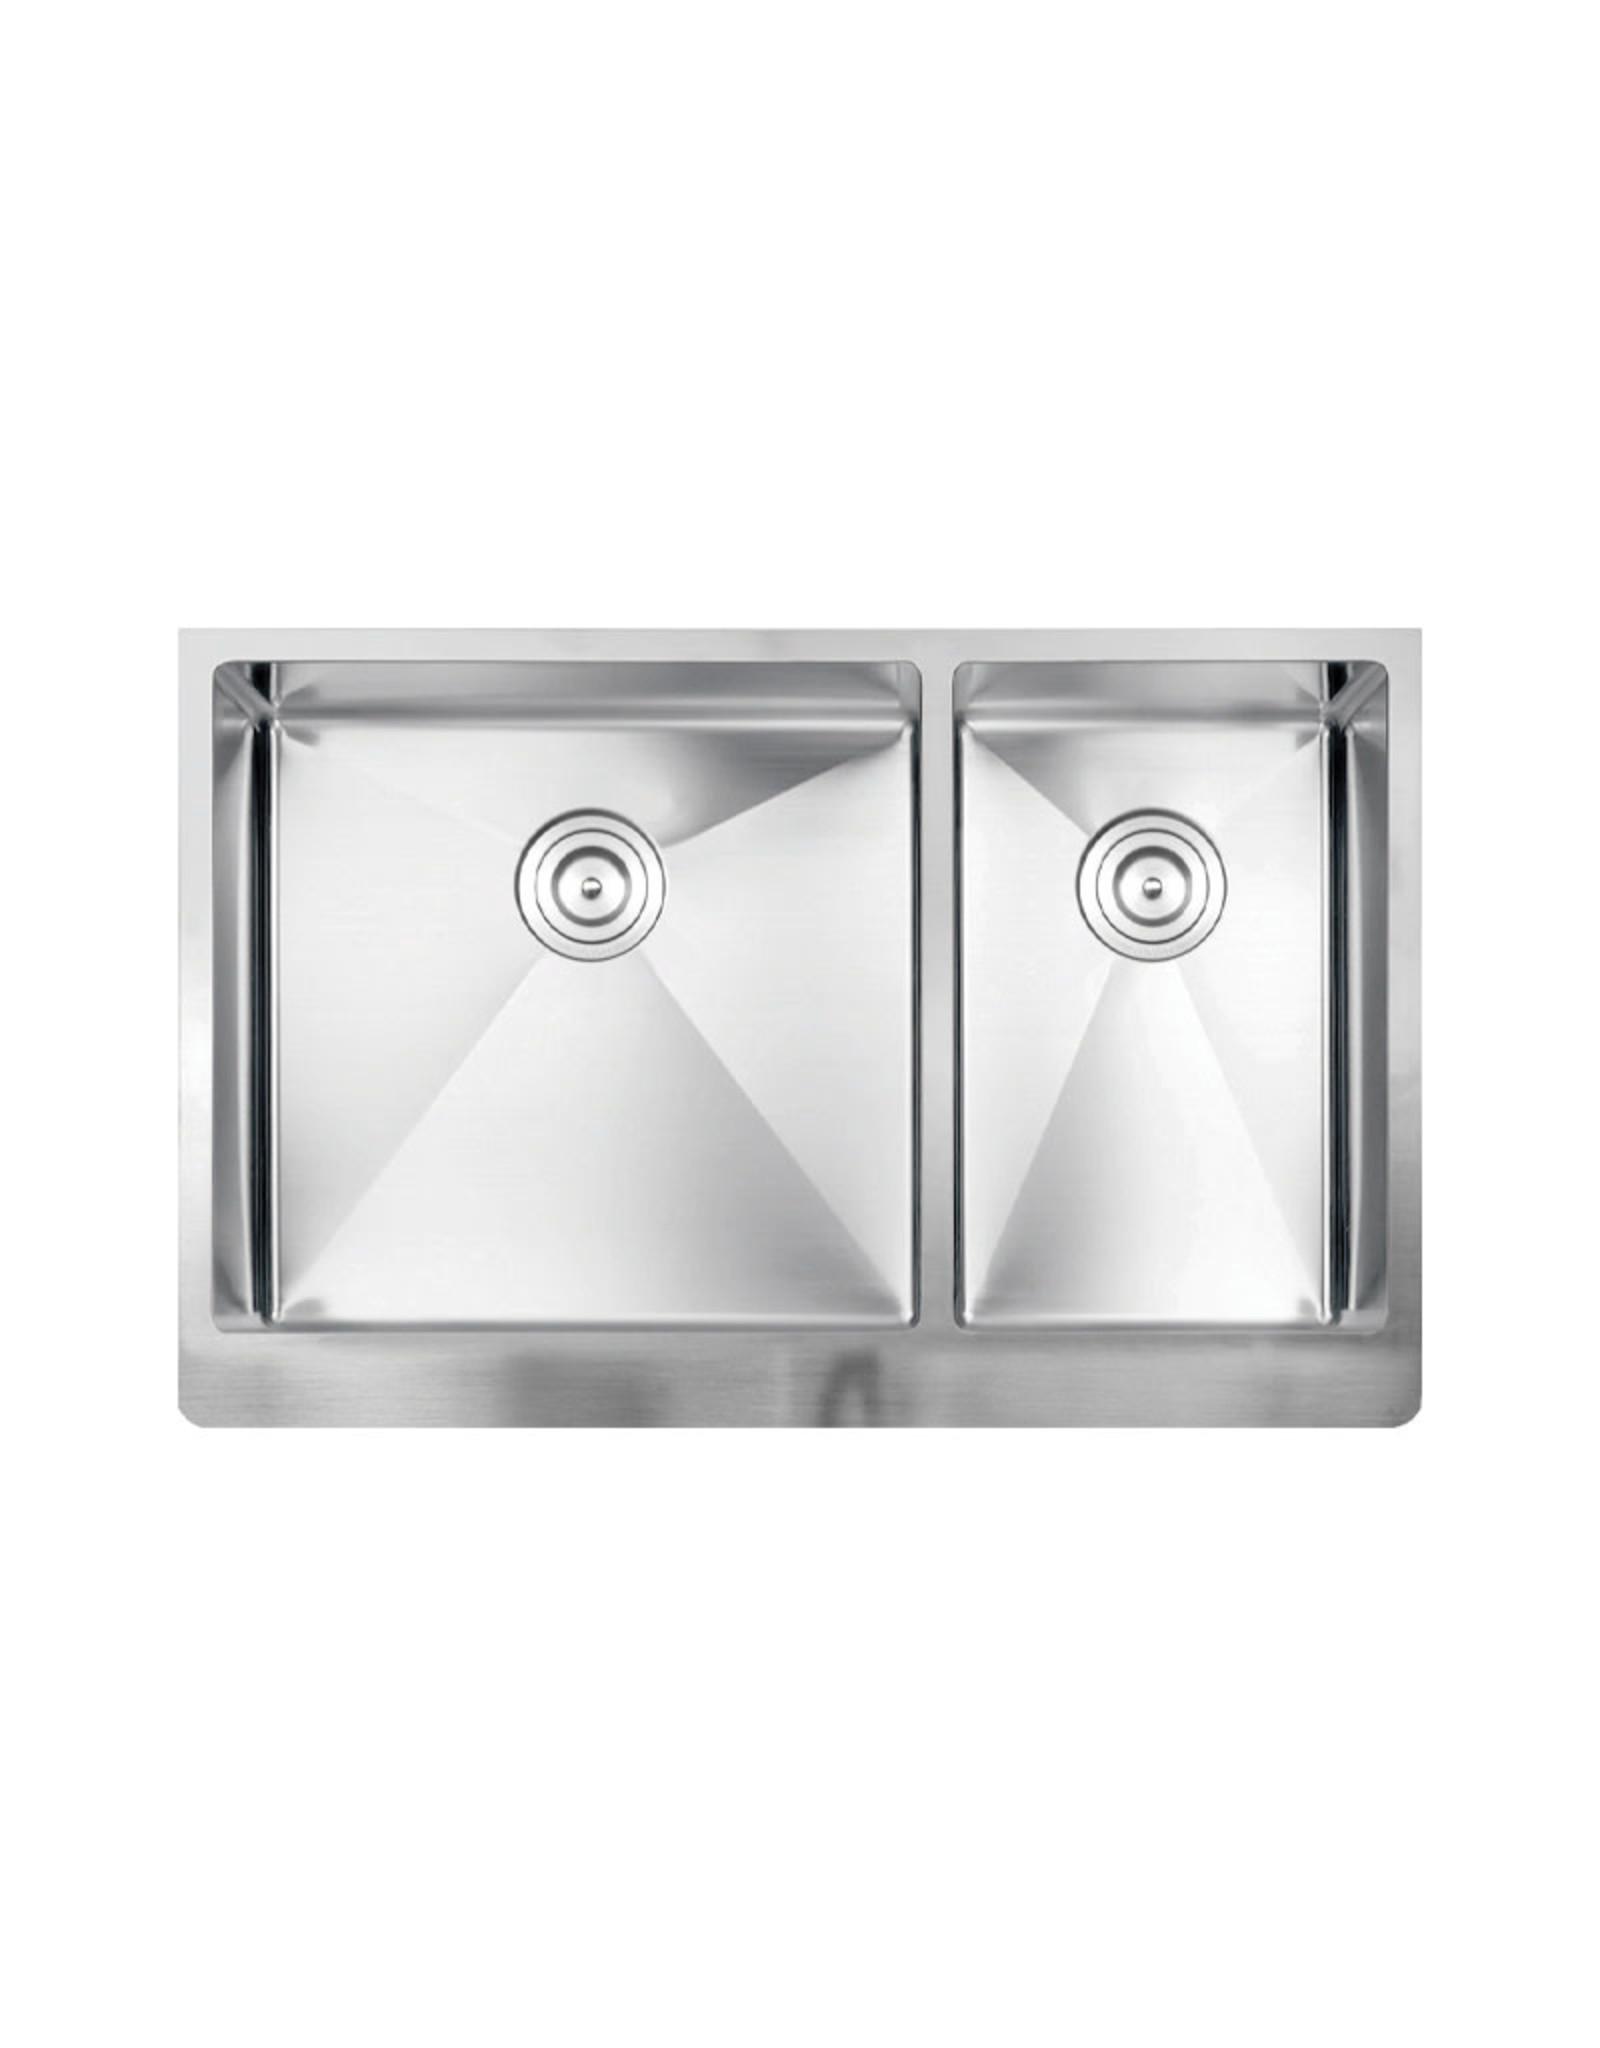 "Vogt Polten Doppelt 16R Apron Front Kitchen Sink Double Bowl (60/40) 32 ⅞"" x 20 ¾"" x 10"" With Bottom Grids"